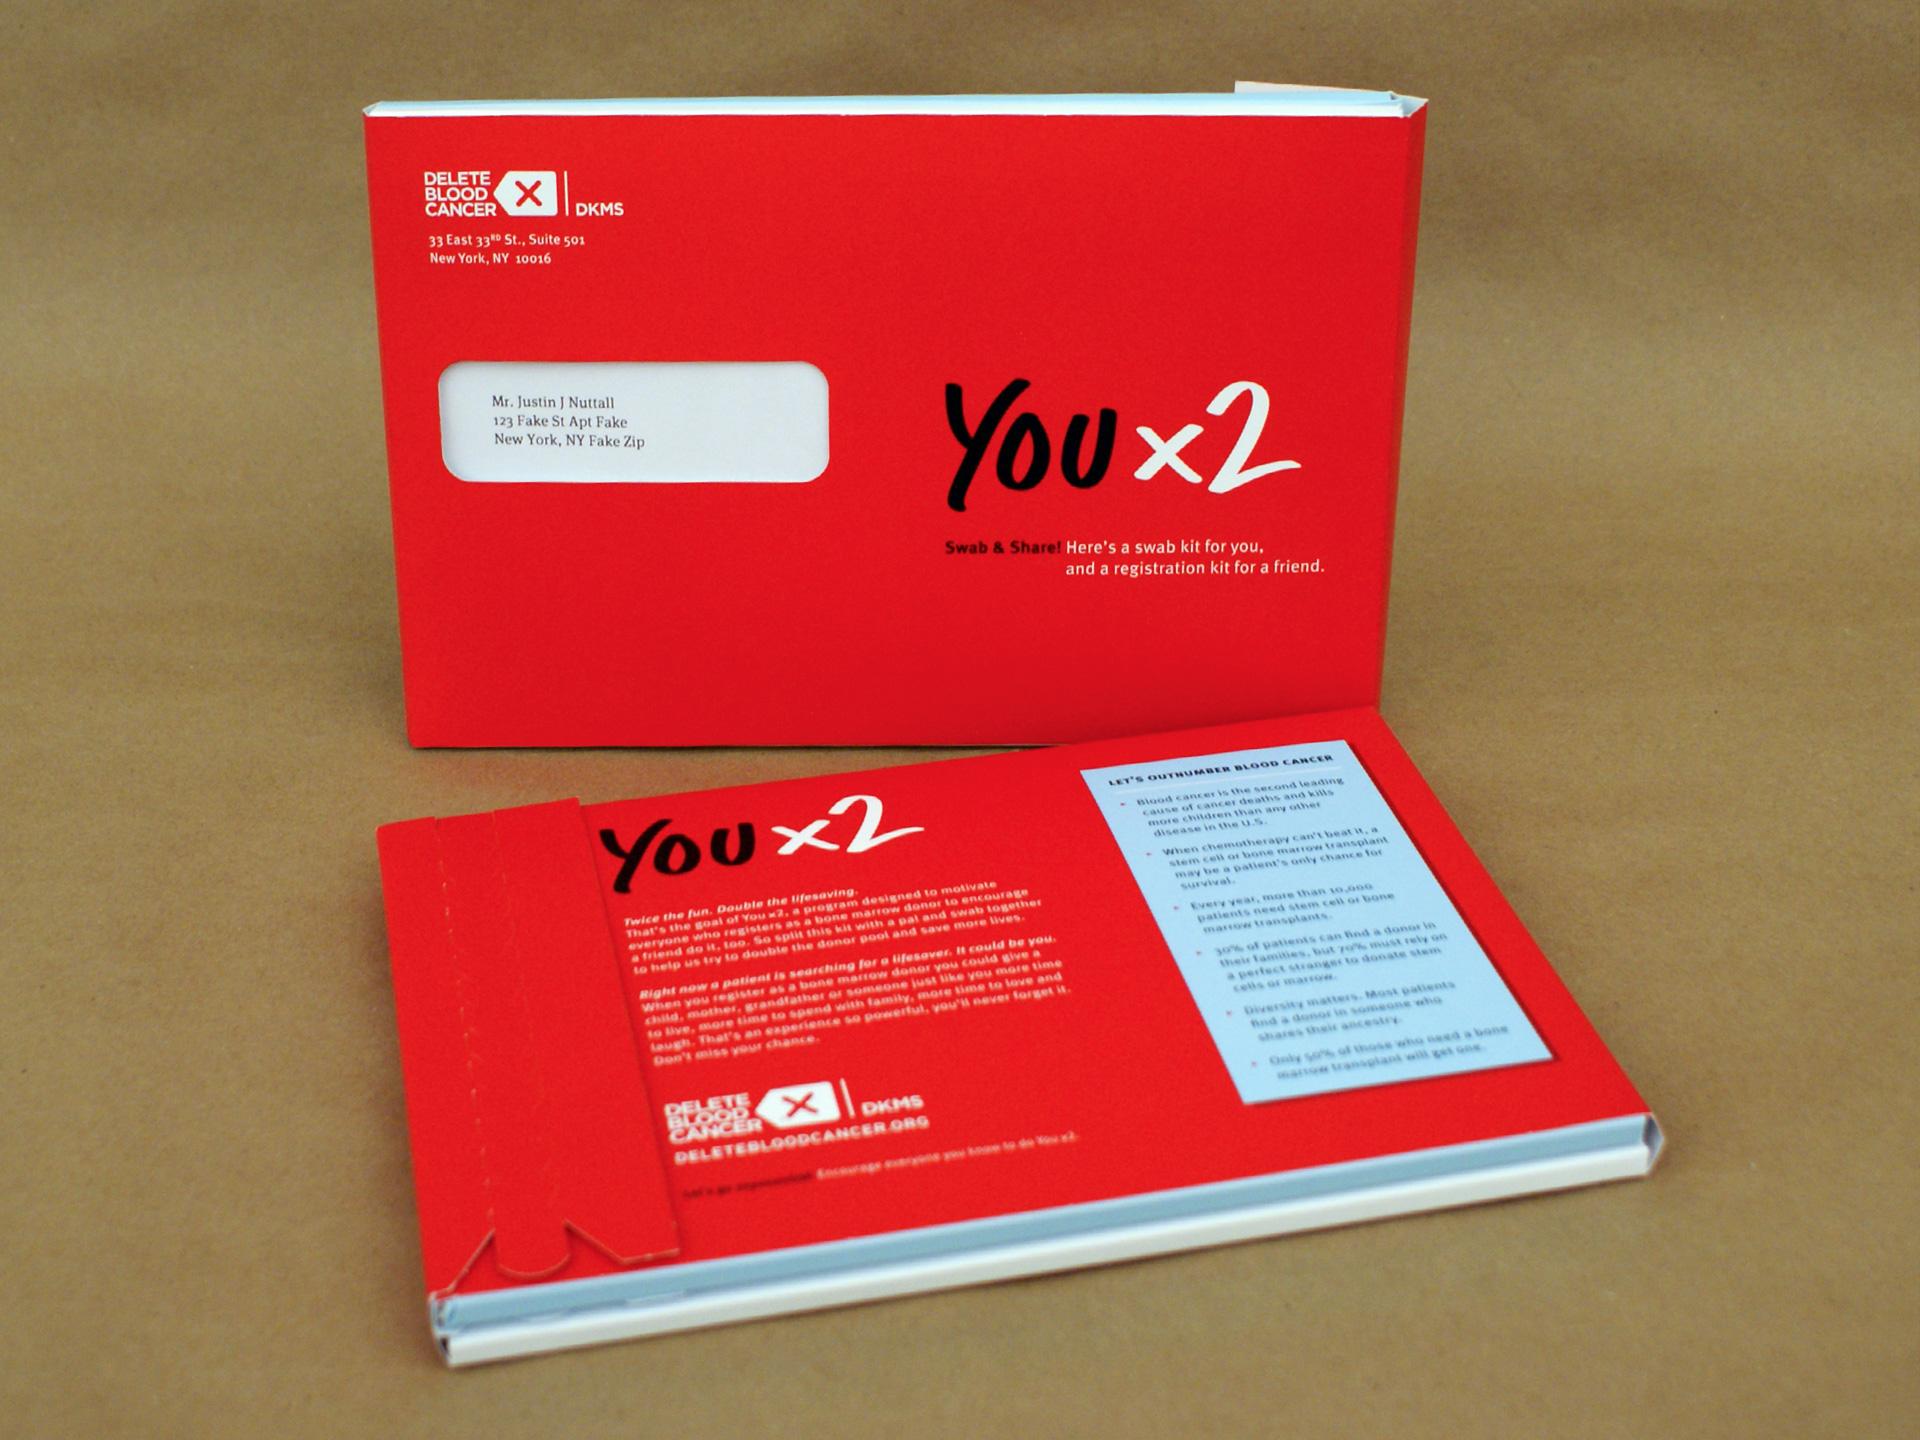 YOUX2-pkg-2-1920